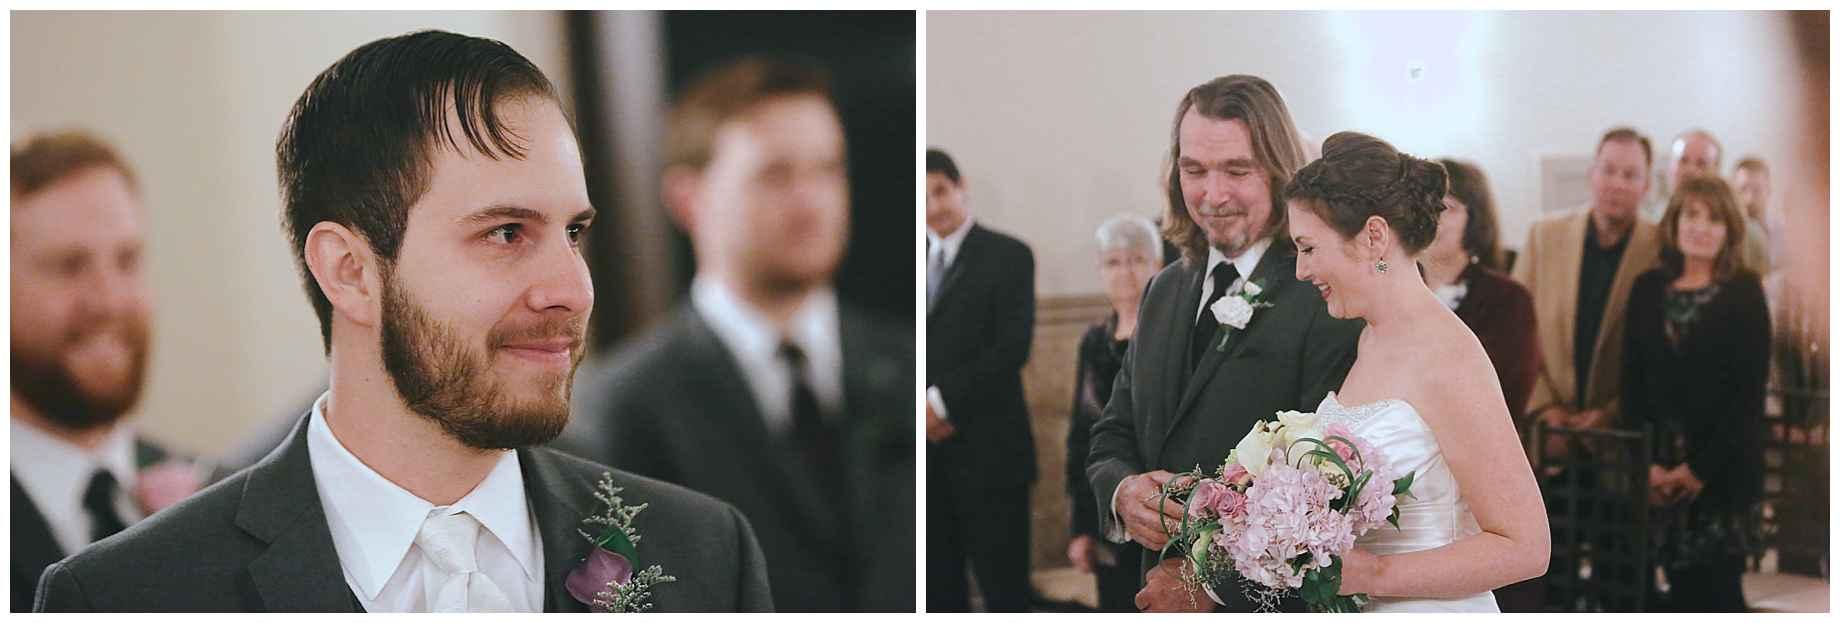 plano-wedding-photographer-10